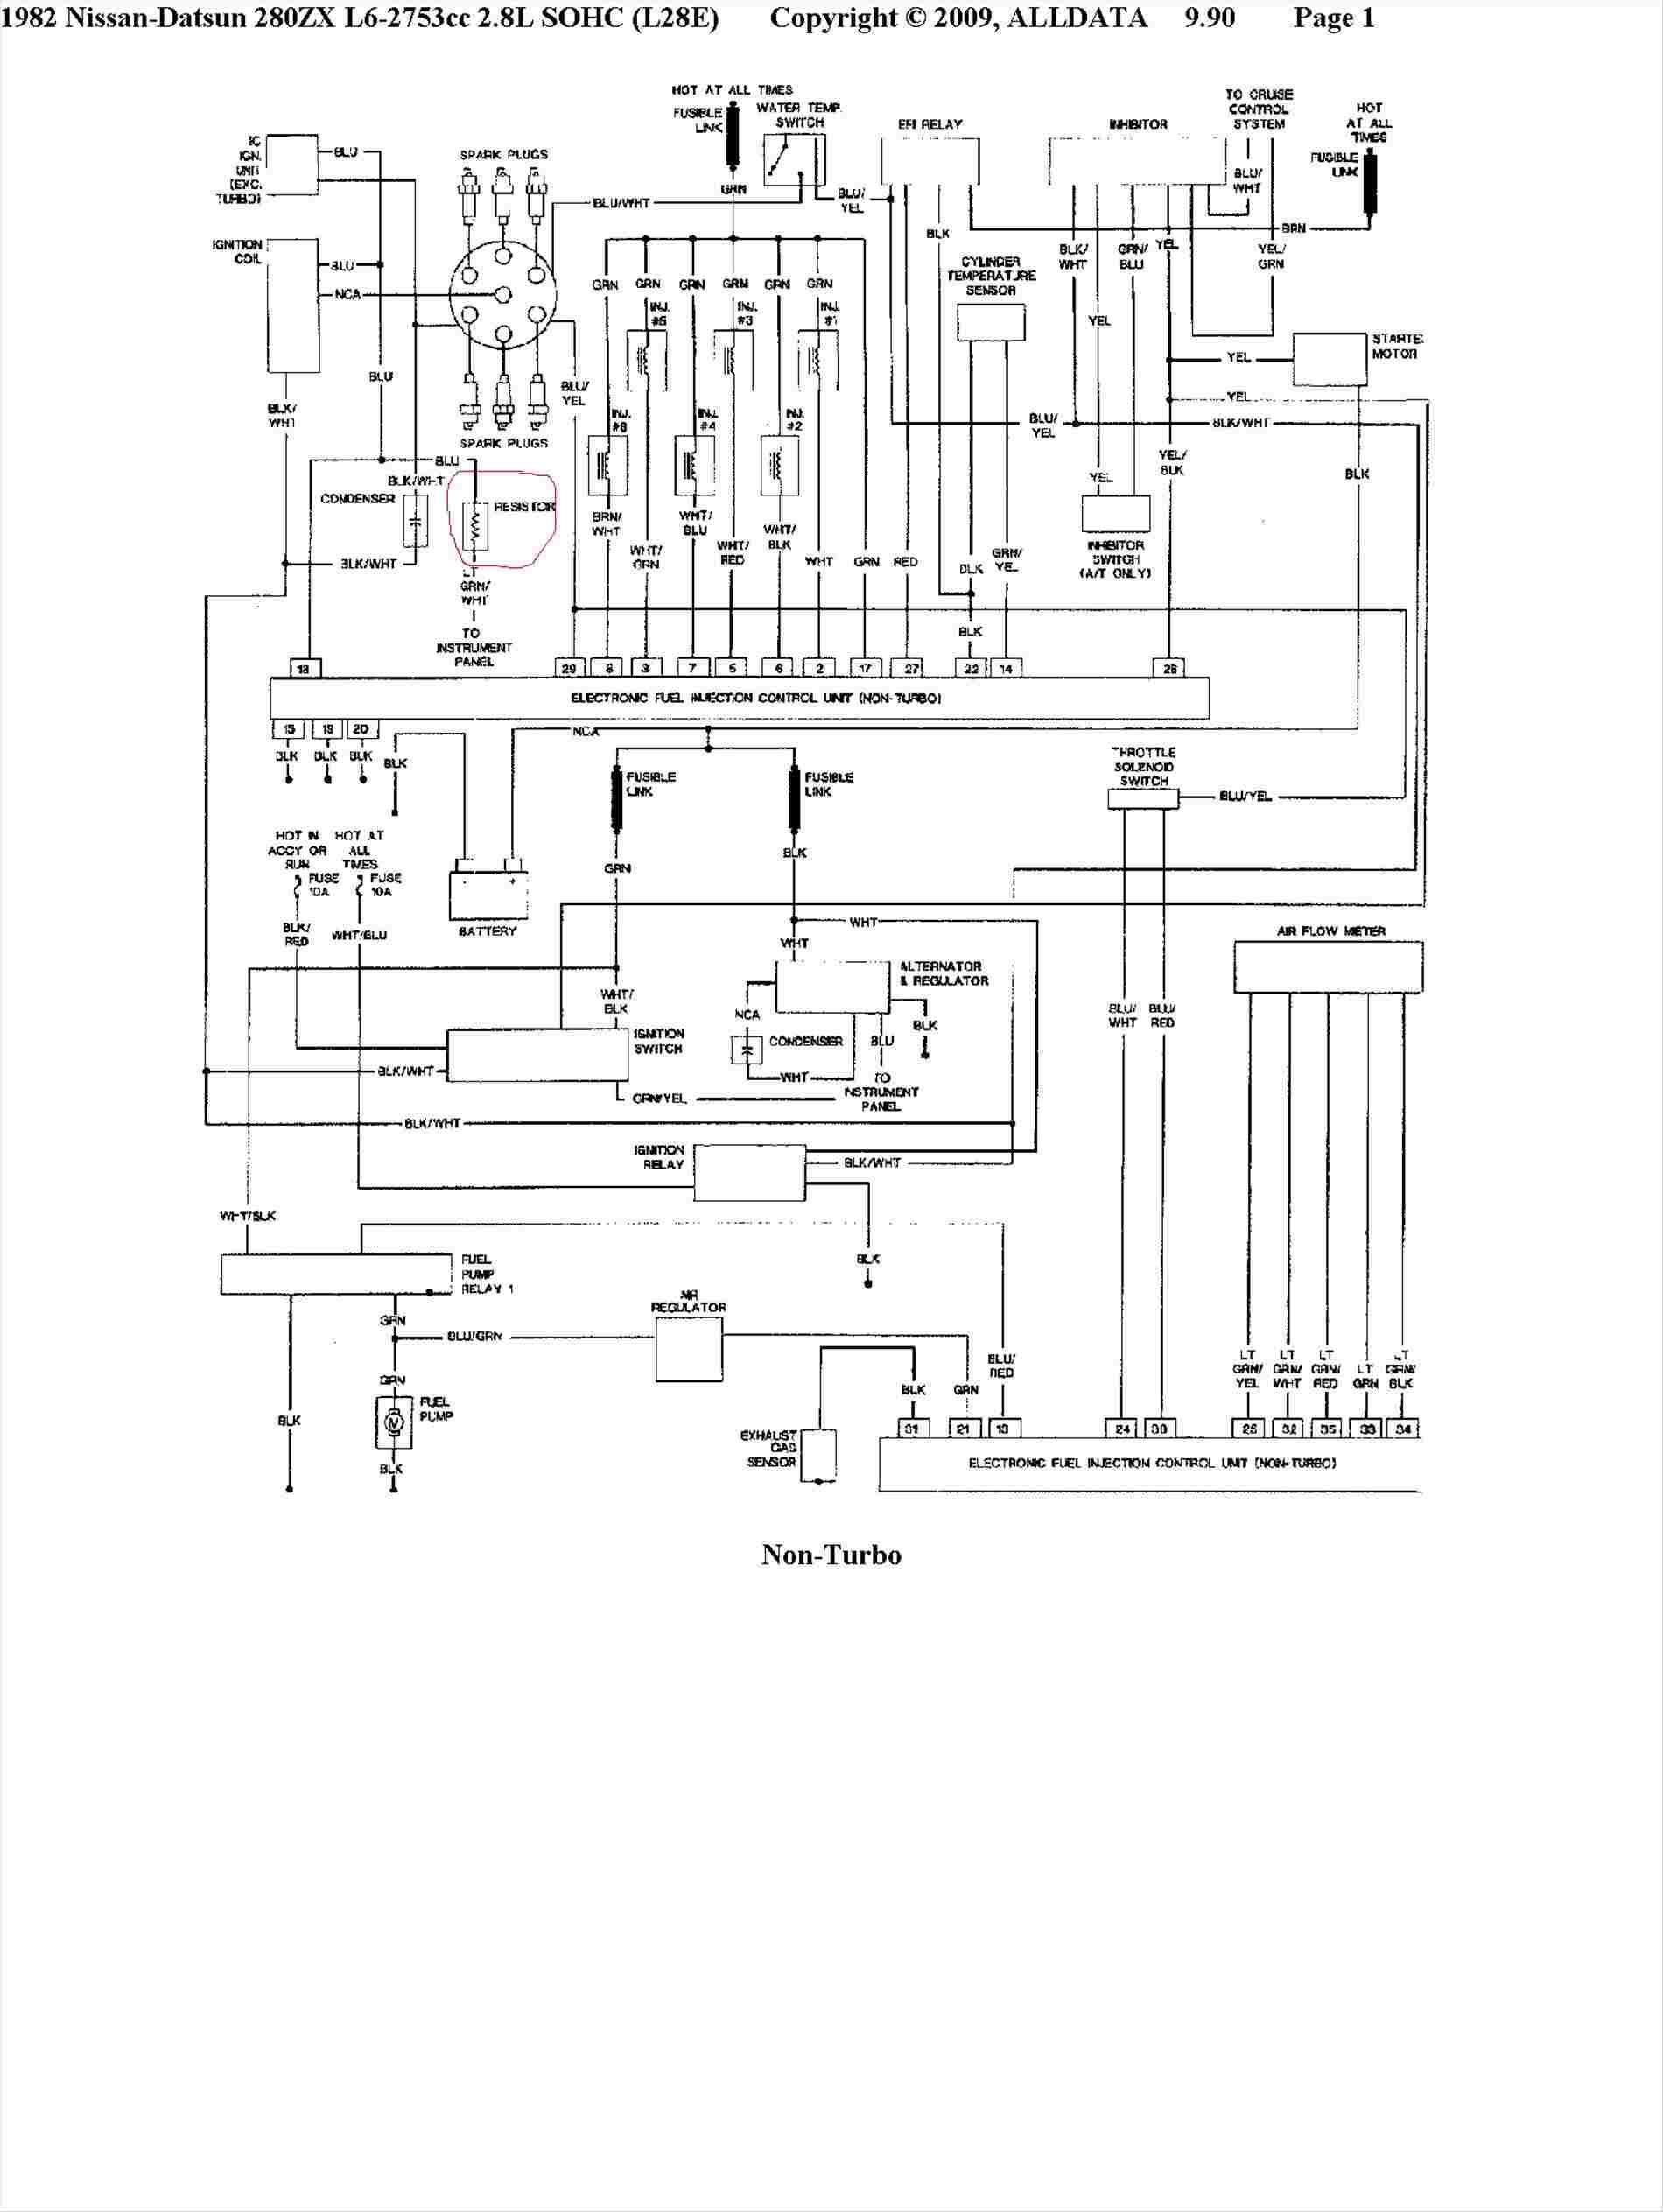 Lionel Train Zw Transformers Wiring Diagram | Wiring Diagram - Lionel Train Wiring Diagram